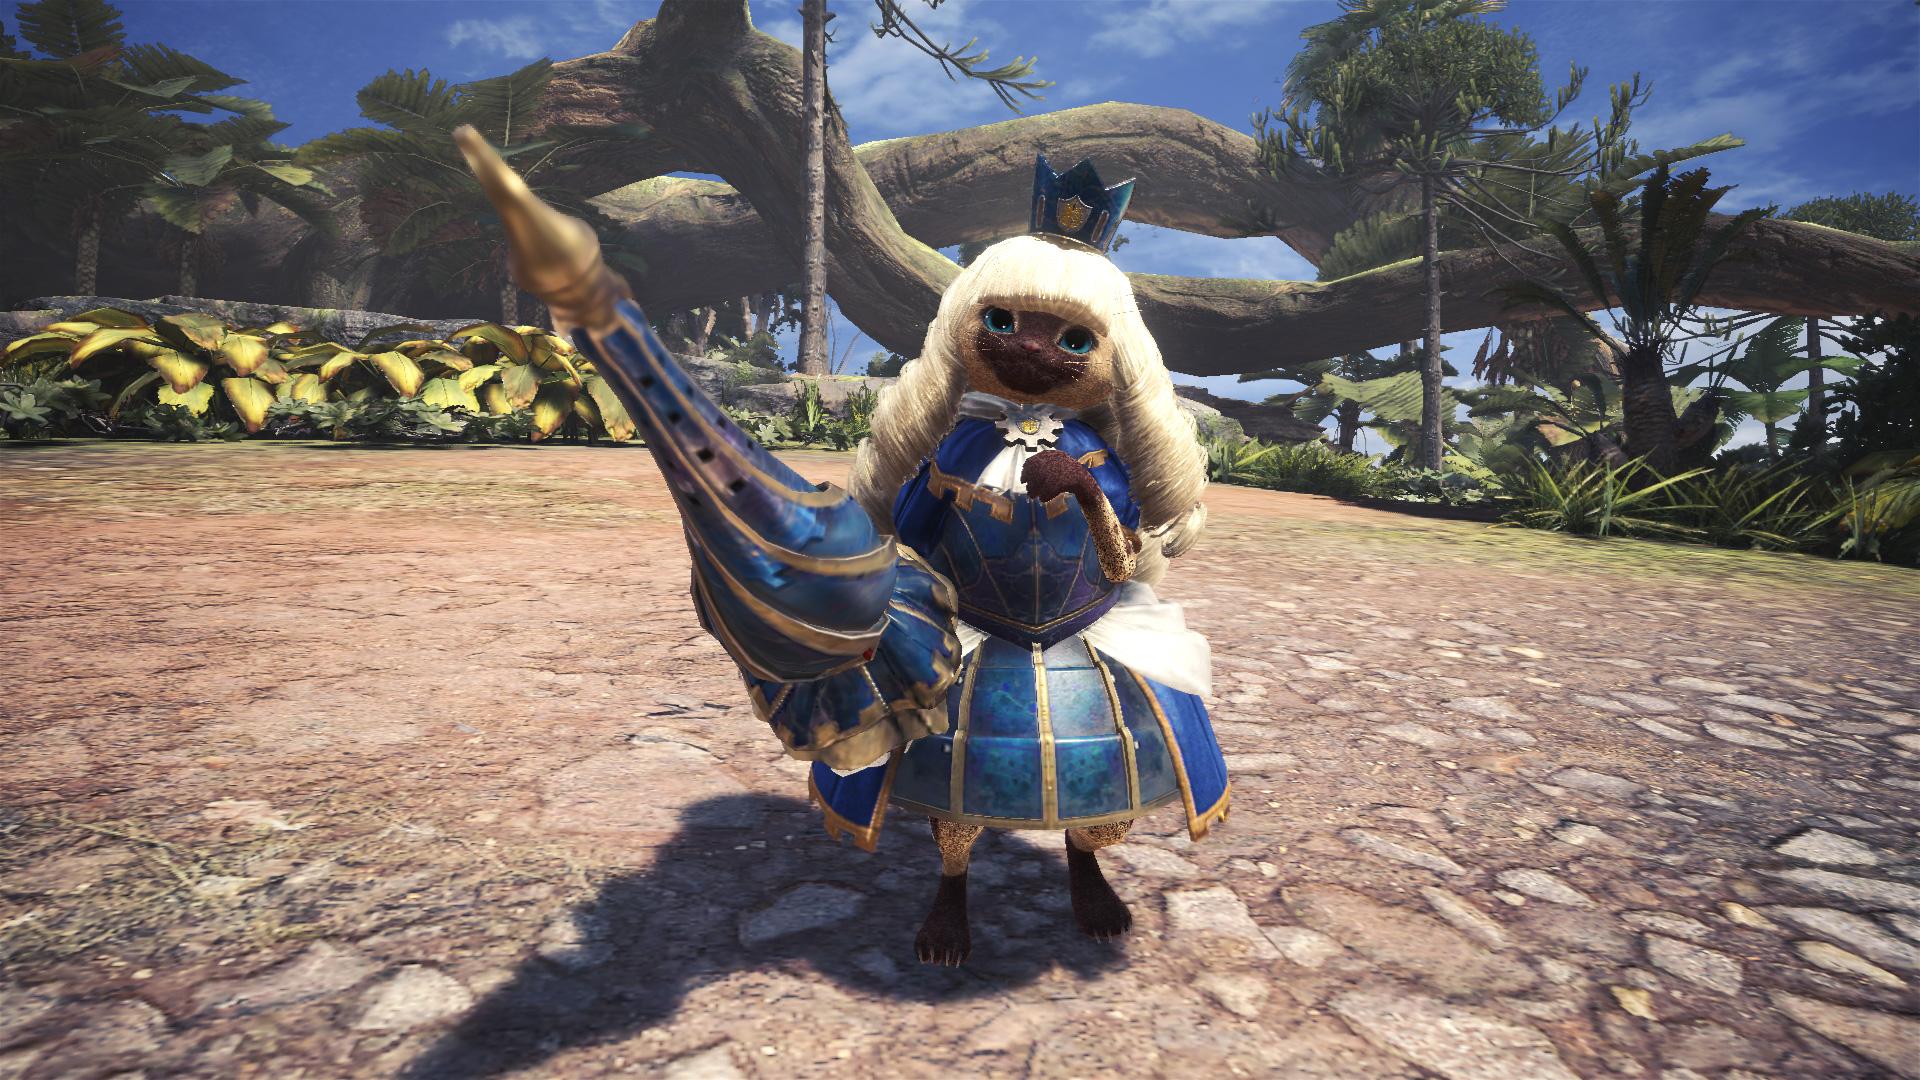 Palico-Eliza - Monster Hunter: World